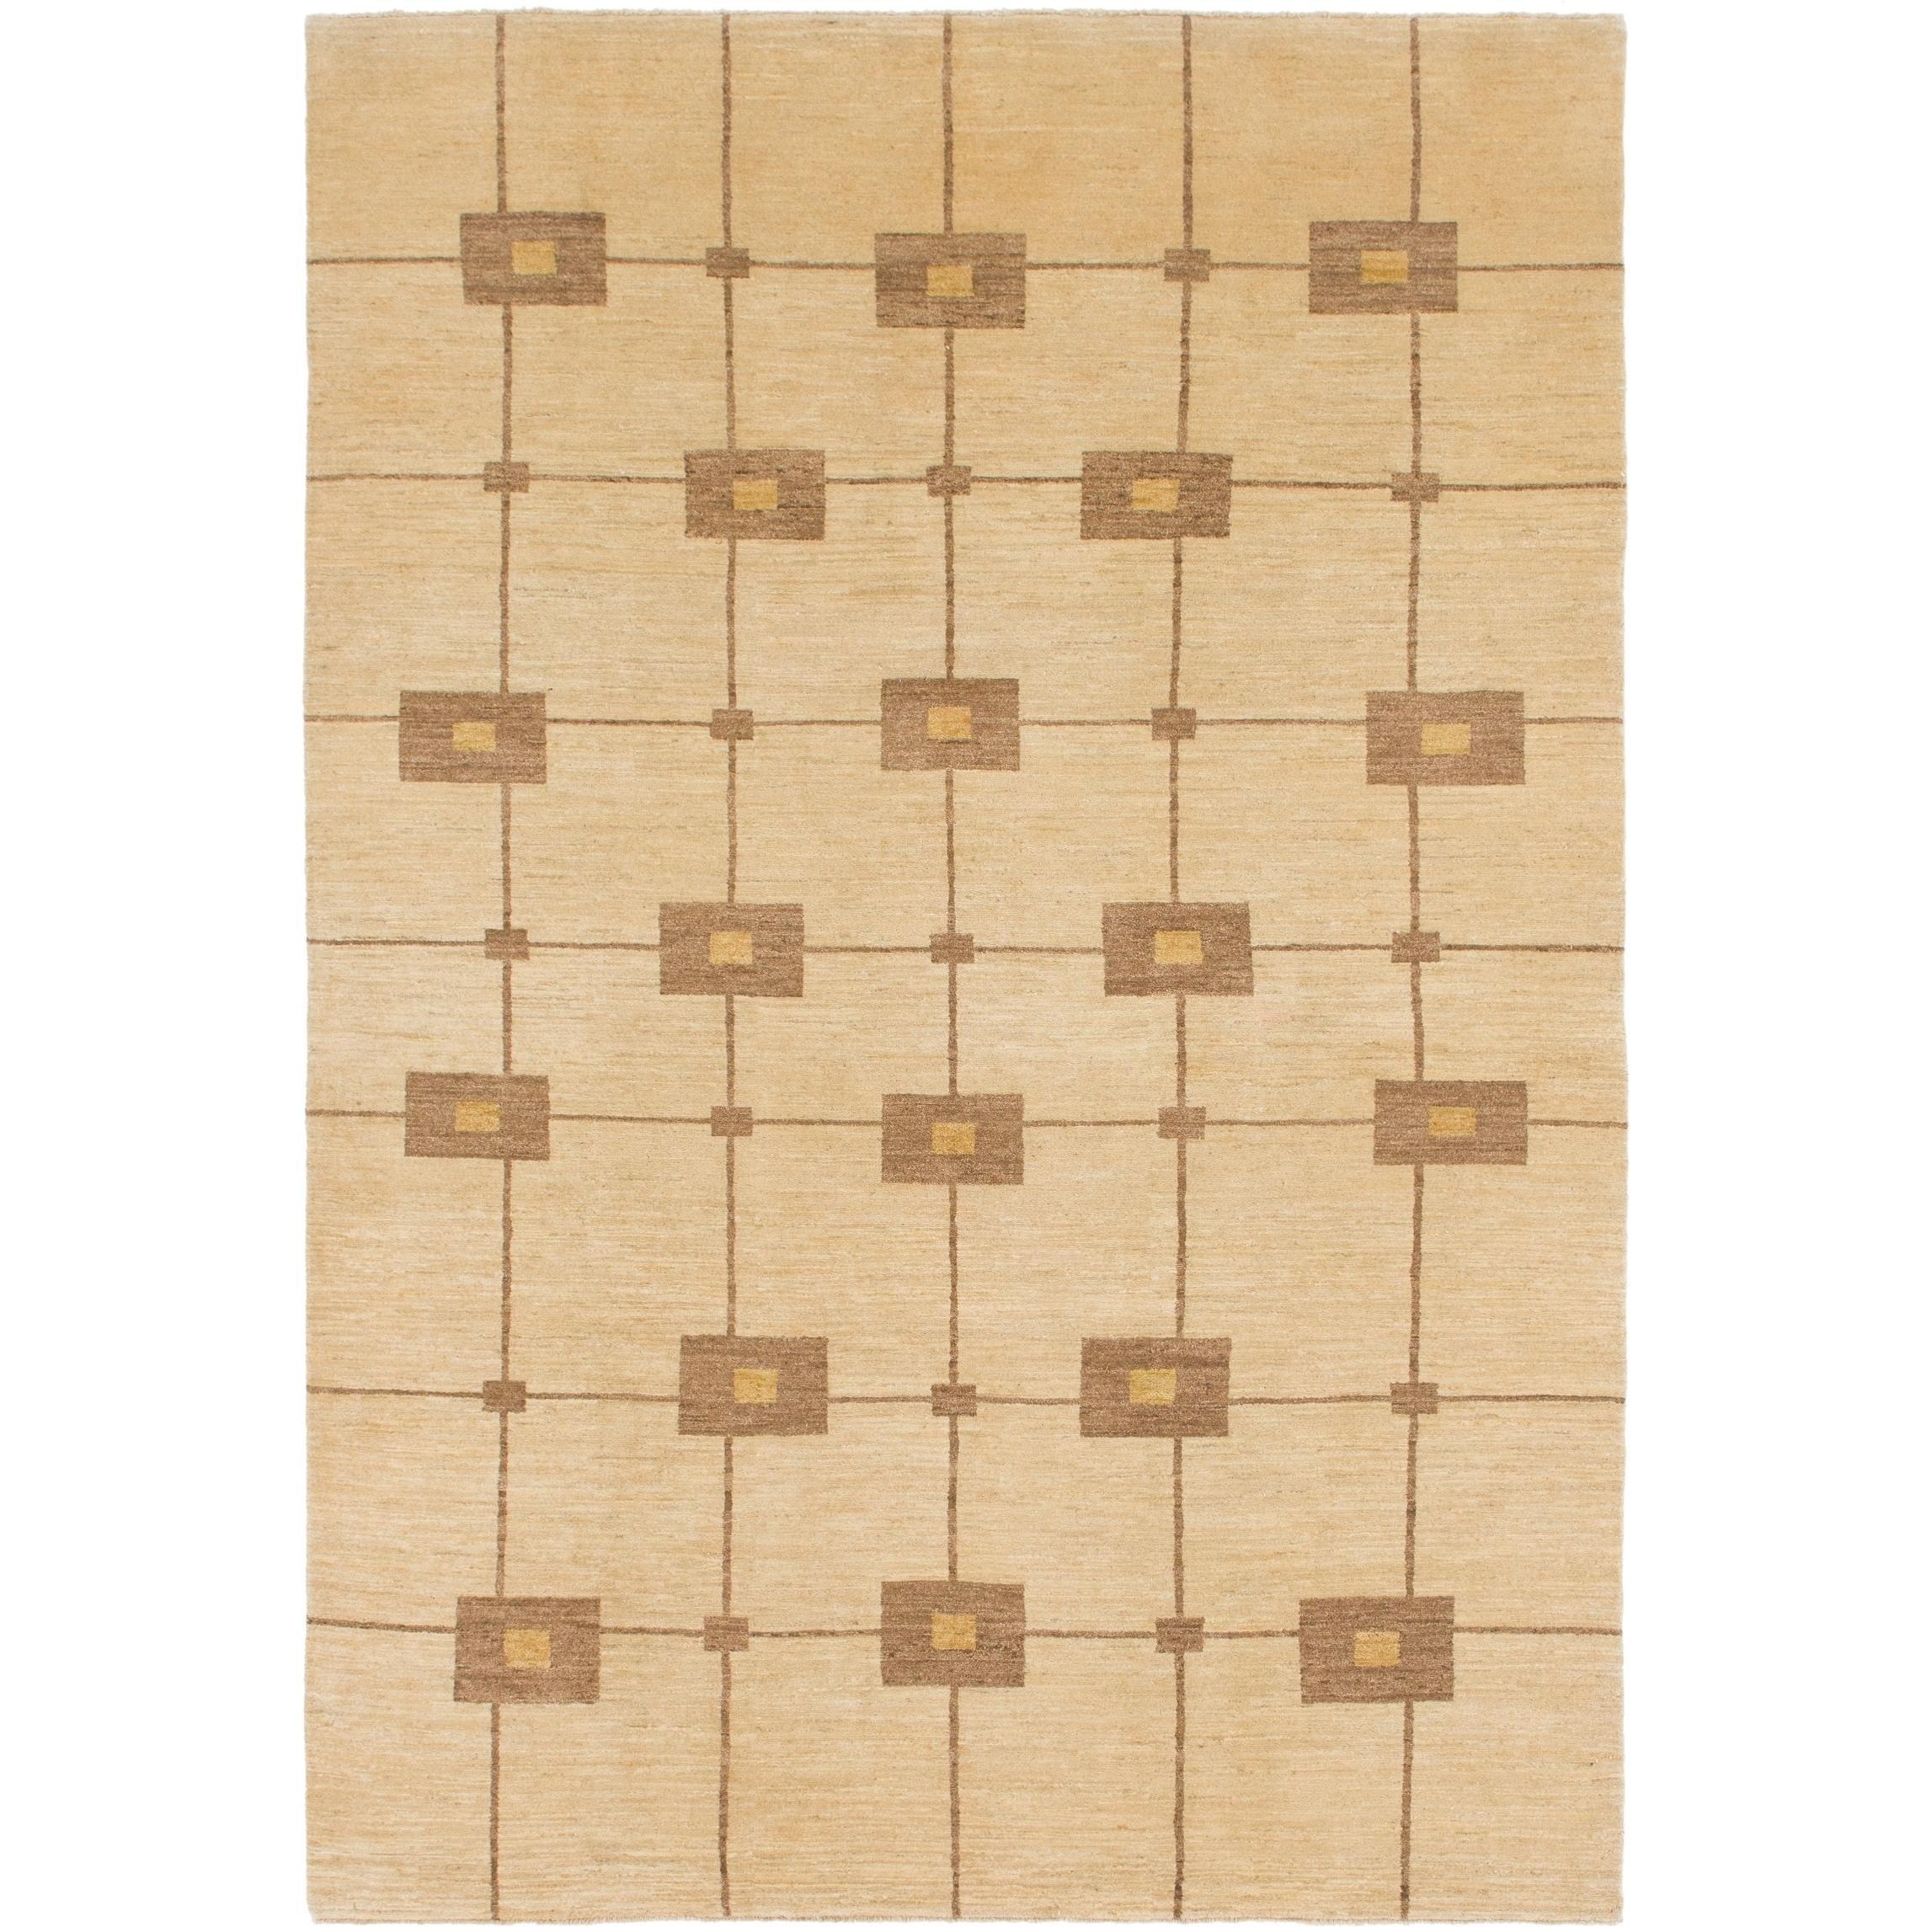 Hand Knotted Kashkuli Gabbeh Wool Area Rug - 6 7 x 9 9 (Cream - 6 7 x 9 9)